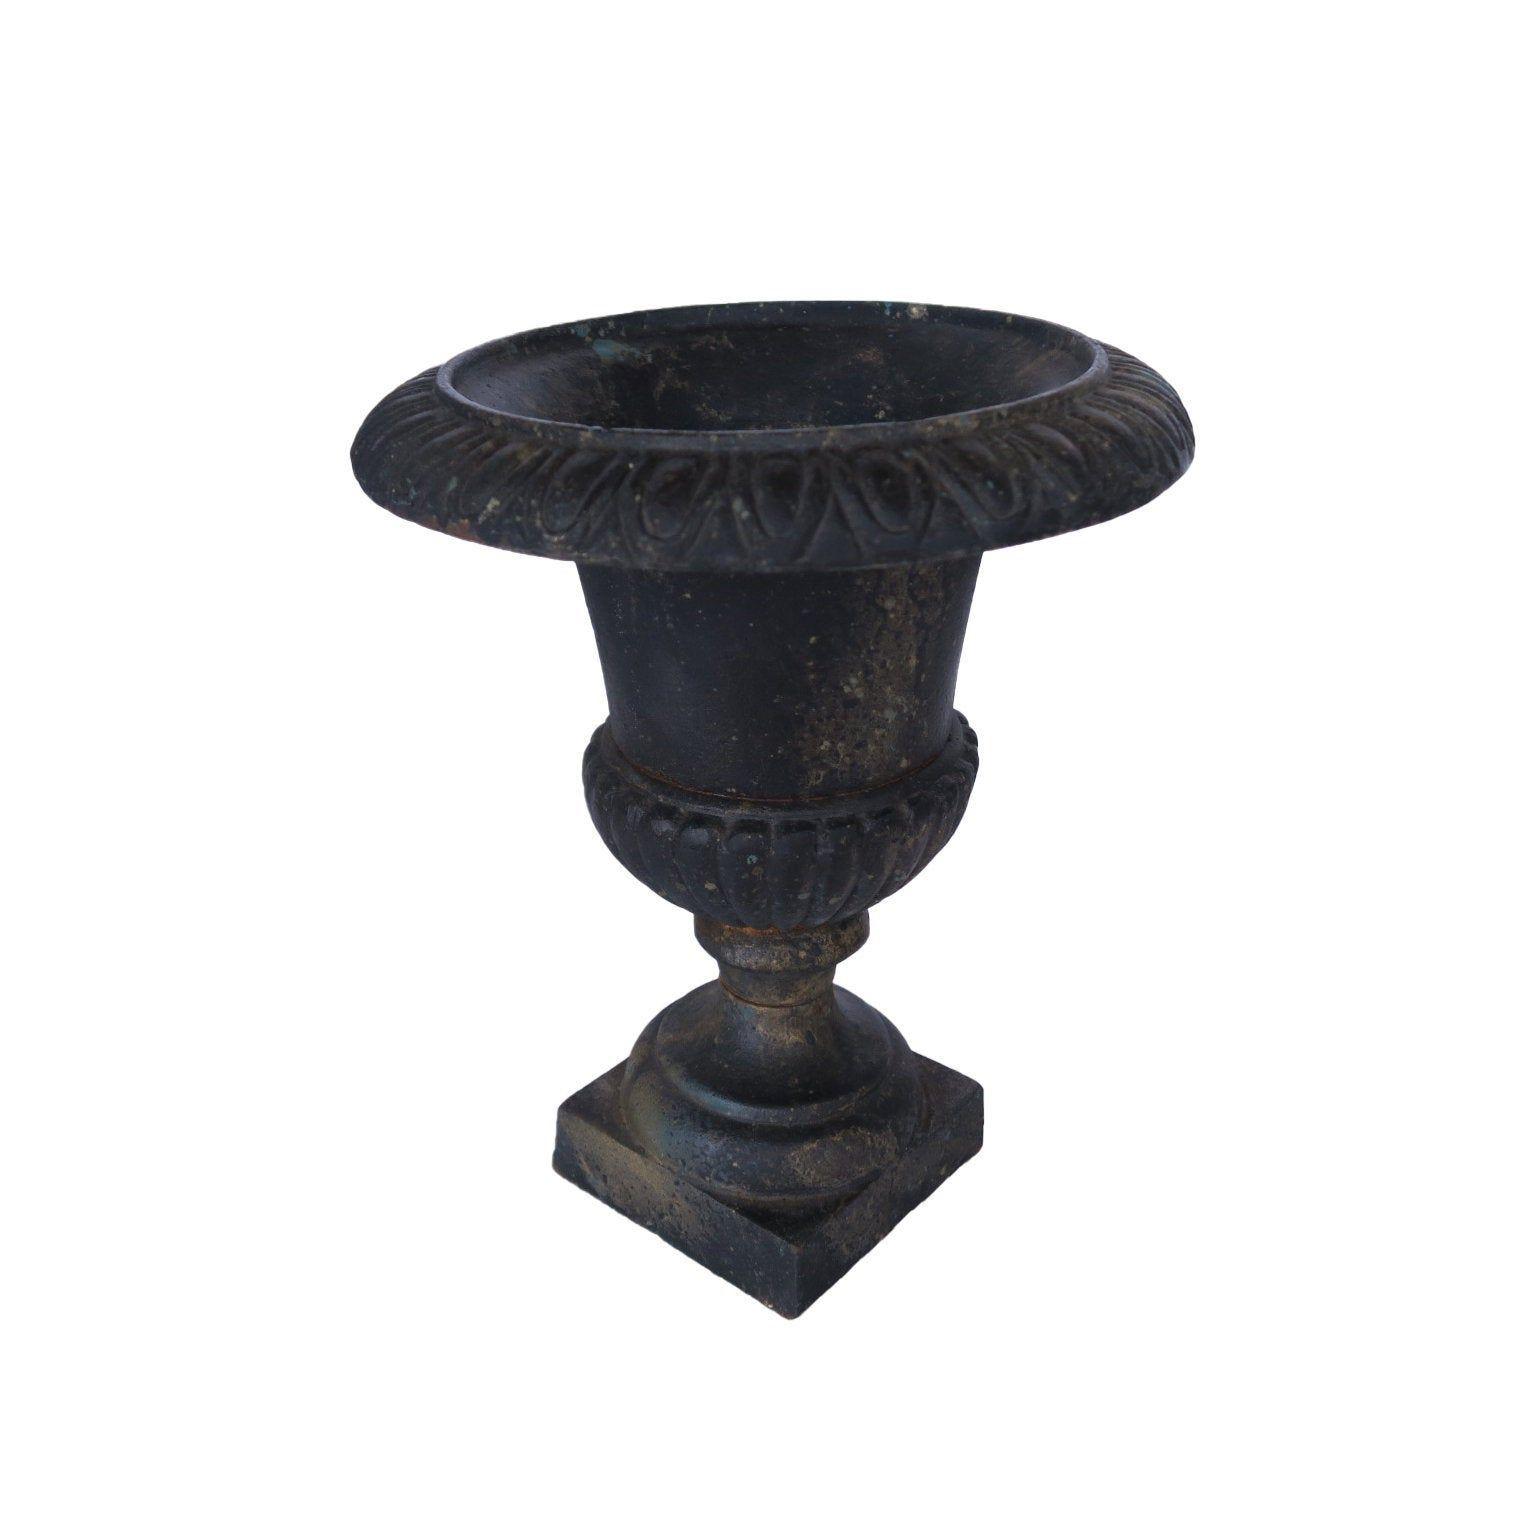 Vintage Small Black Cast Iron Urn Planter Pot Iron Planters Stoneware Crocks Urn Planters